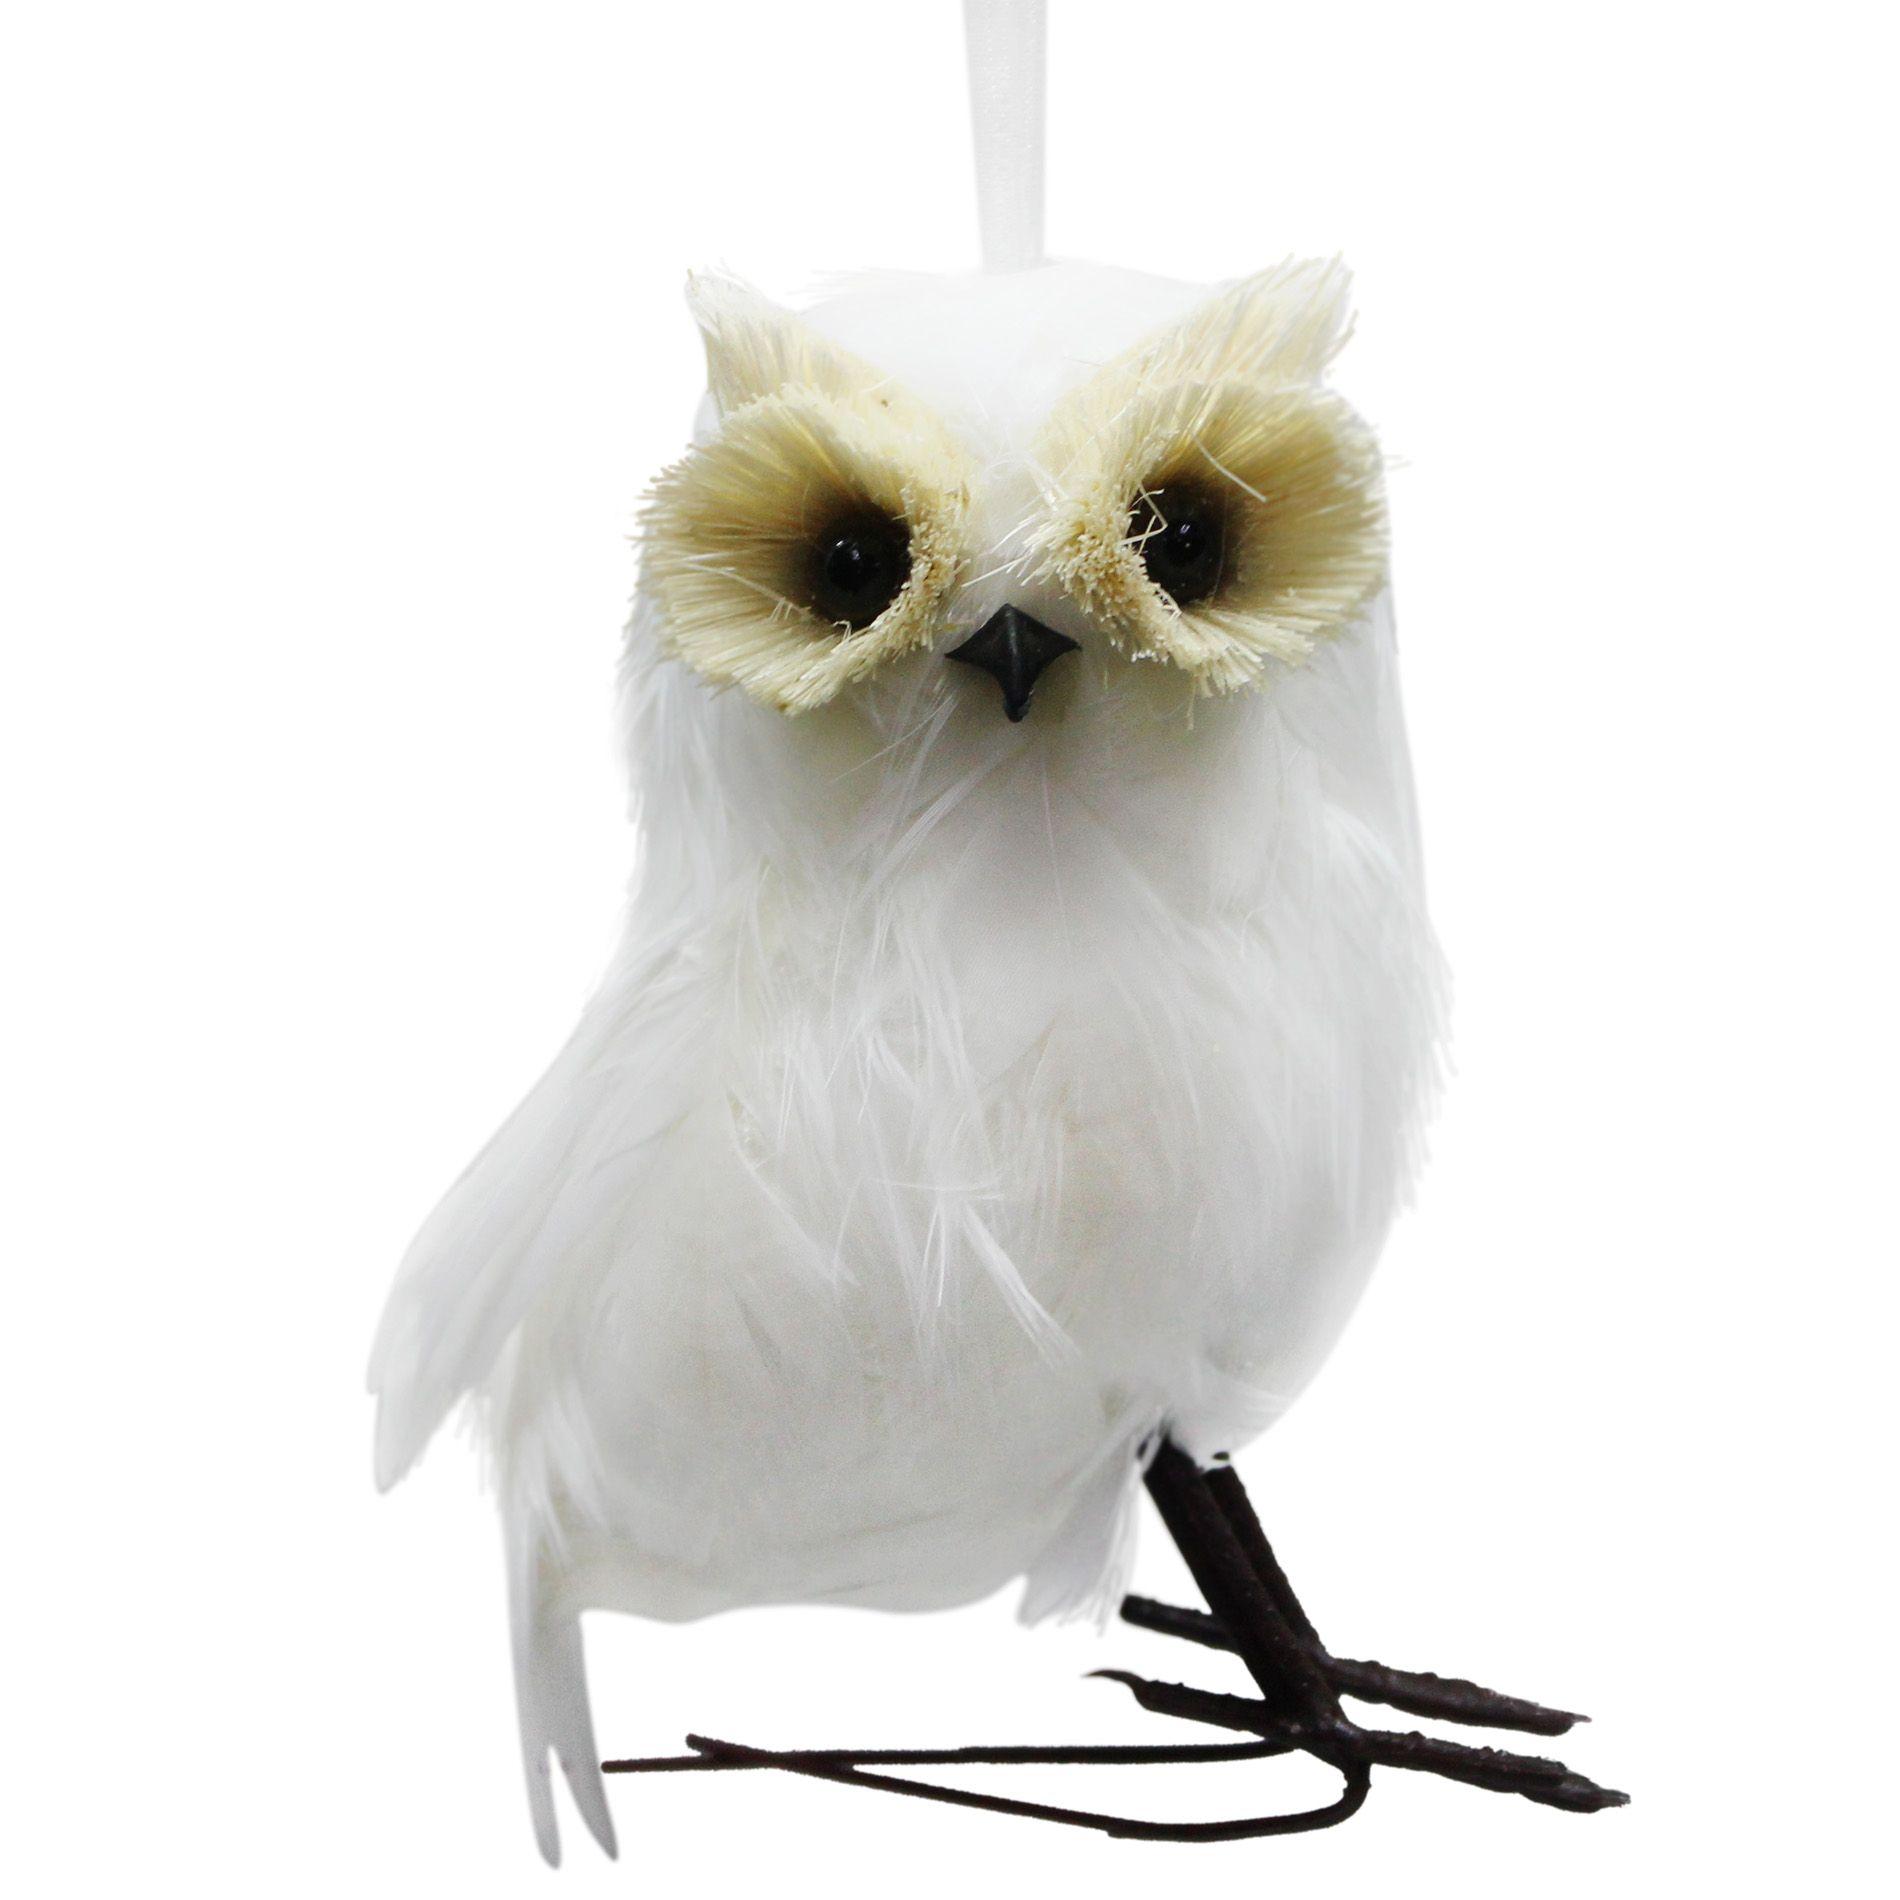 donner and blitzen inc marabou snowy owl ornament